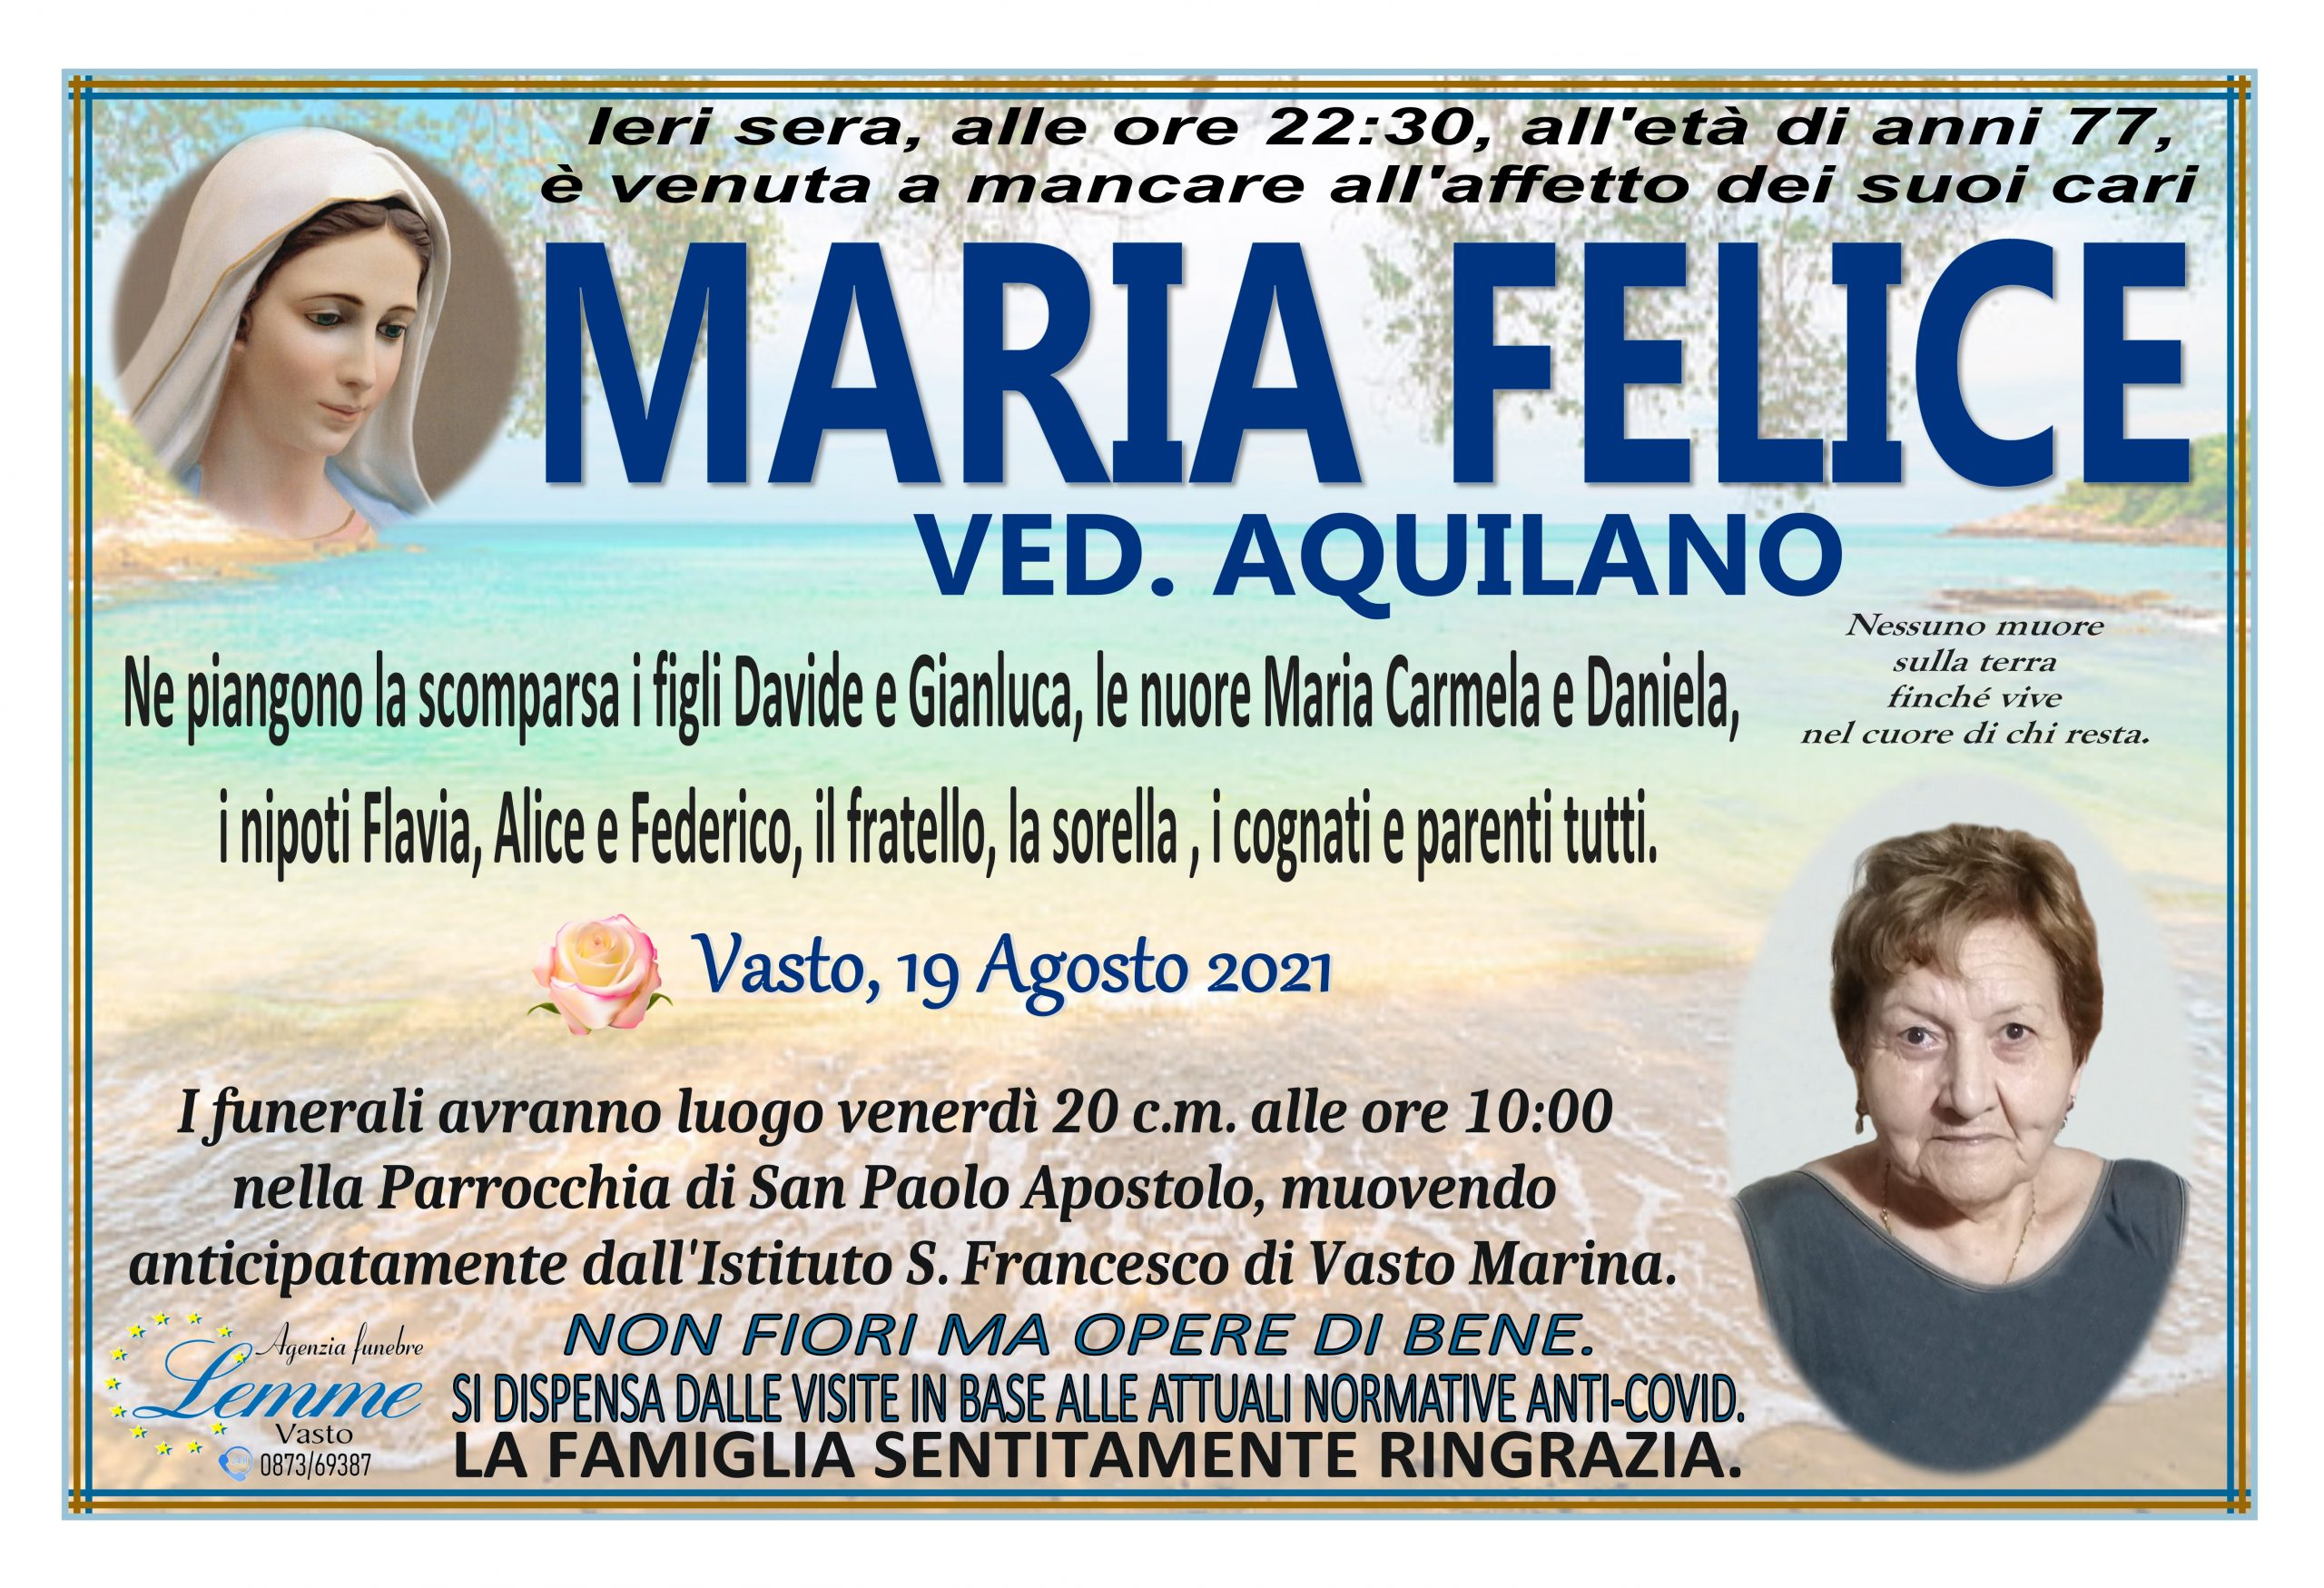 MARIA FELICE